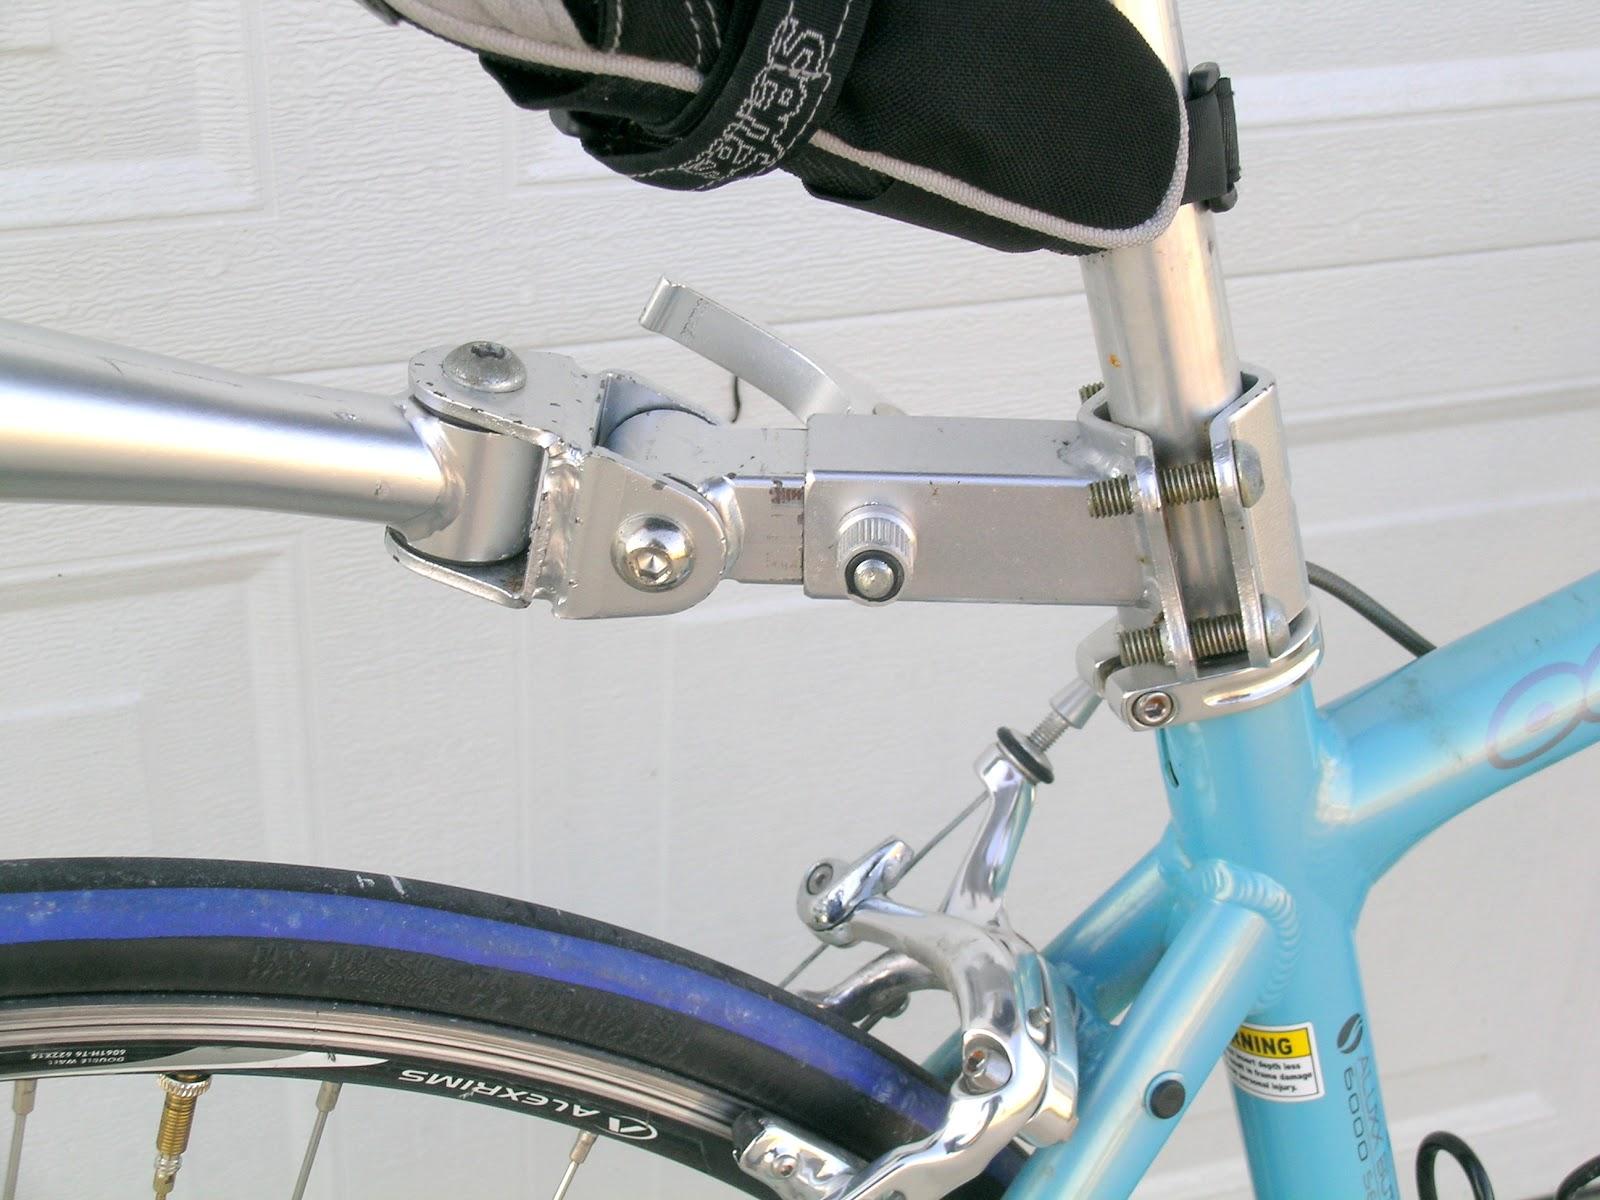 [6d366e] Copilot Bike Seat Instruction Manual .